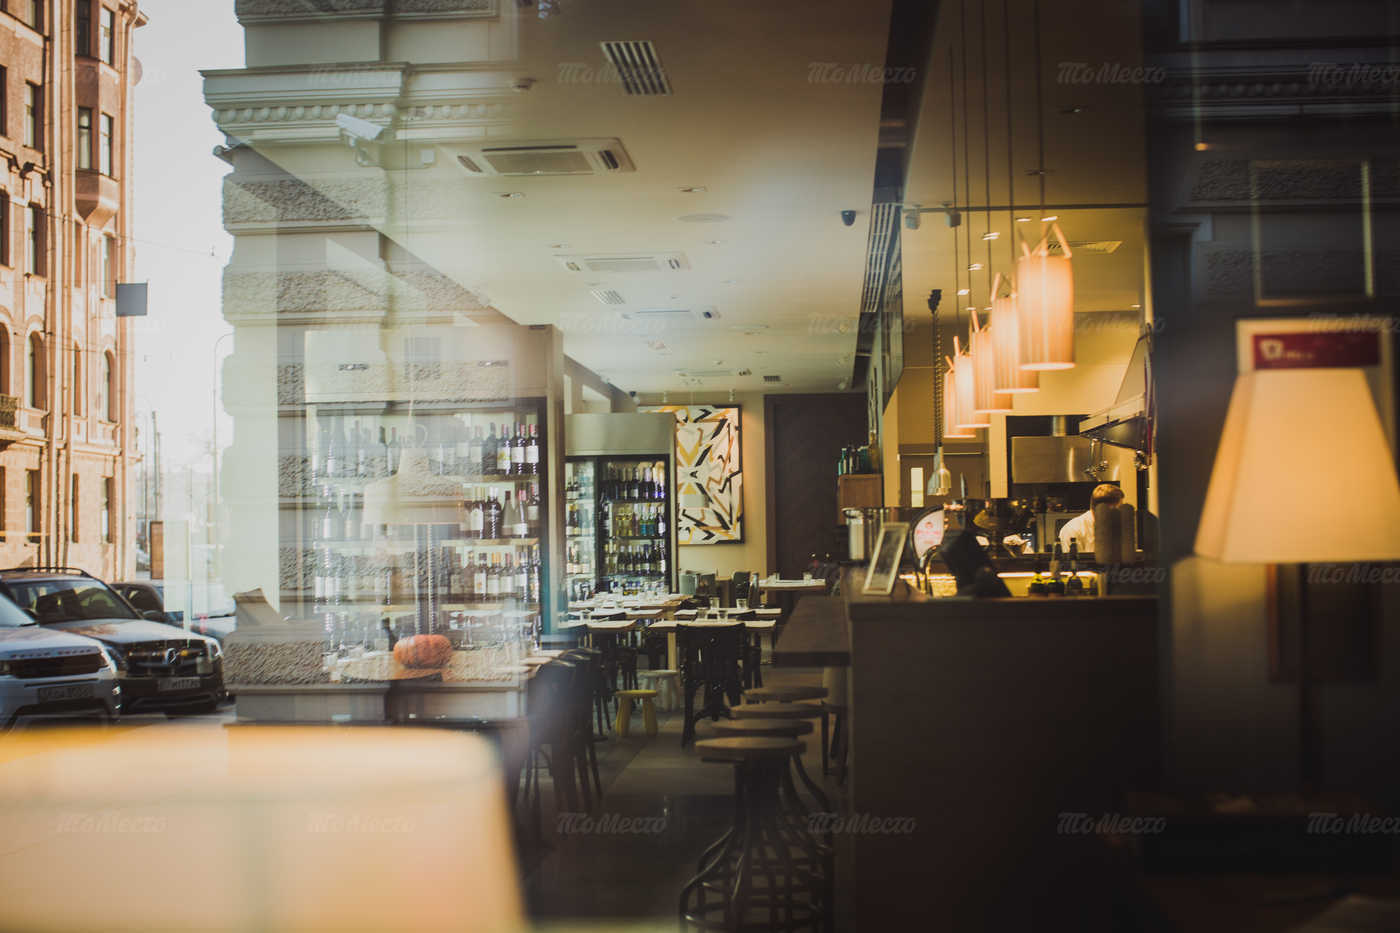 Меню ресторана Пробка на Добролюбова (Probka) на проспекте Добролюбова